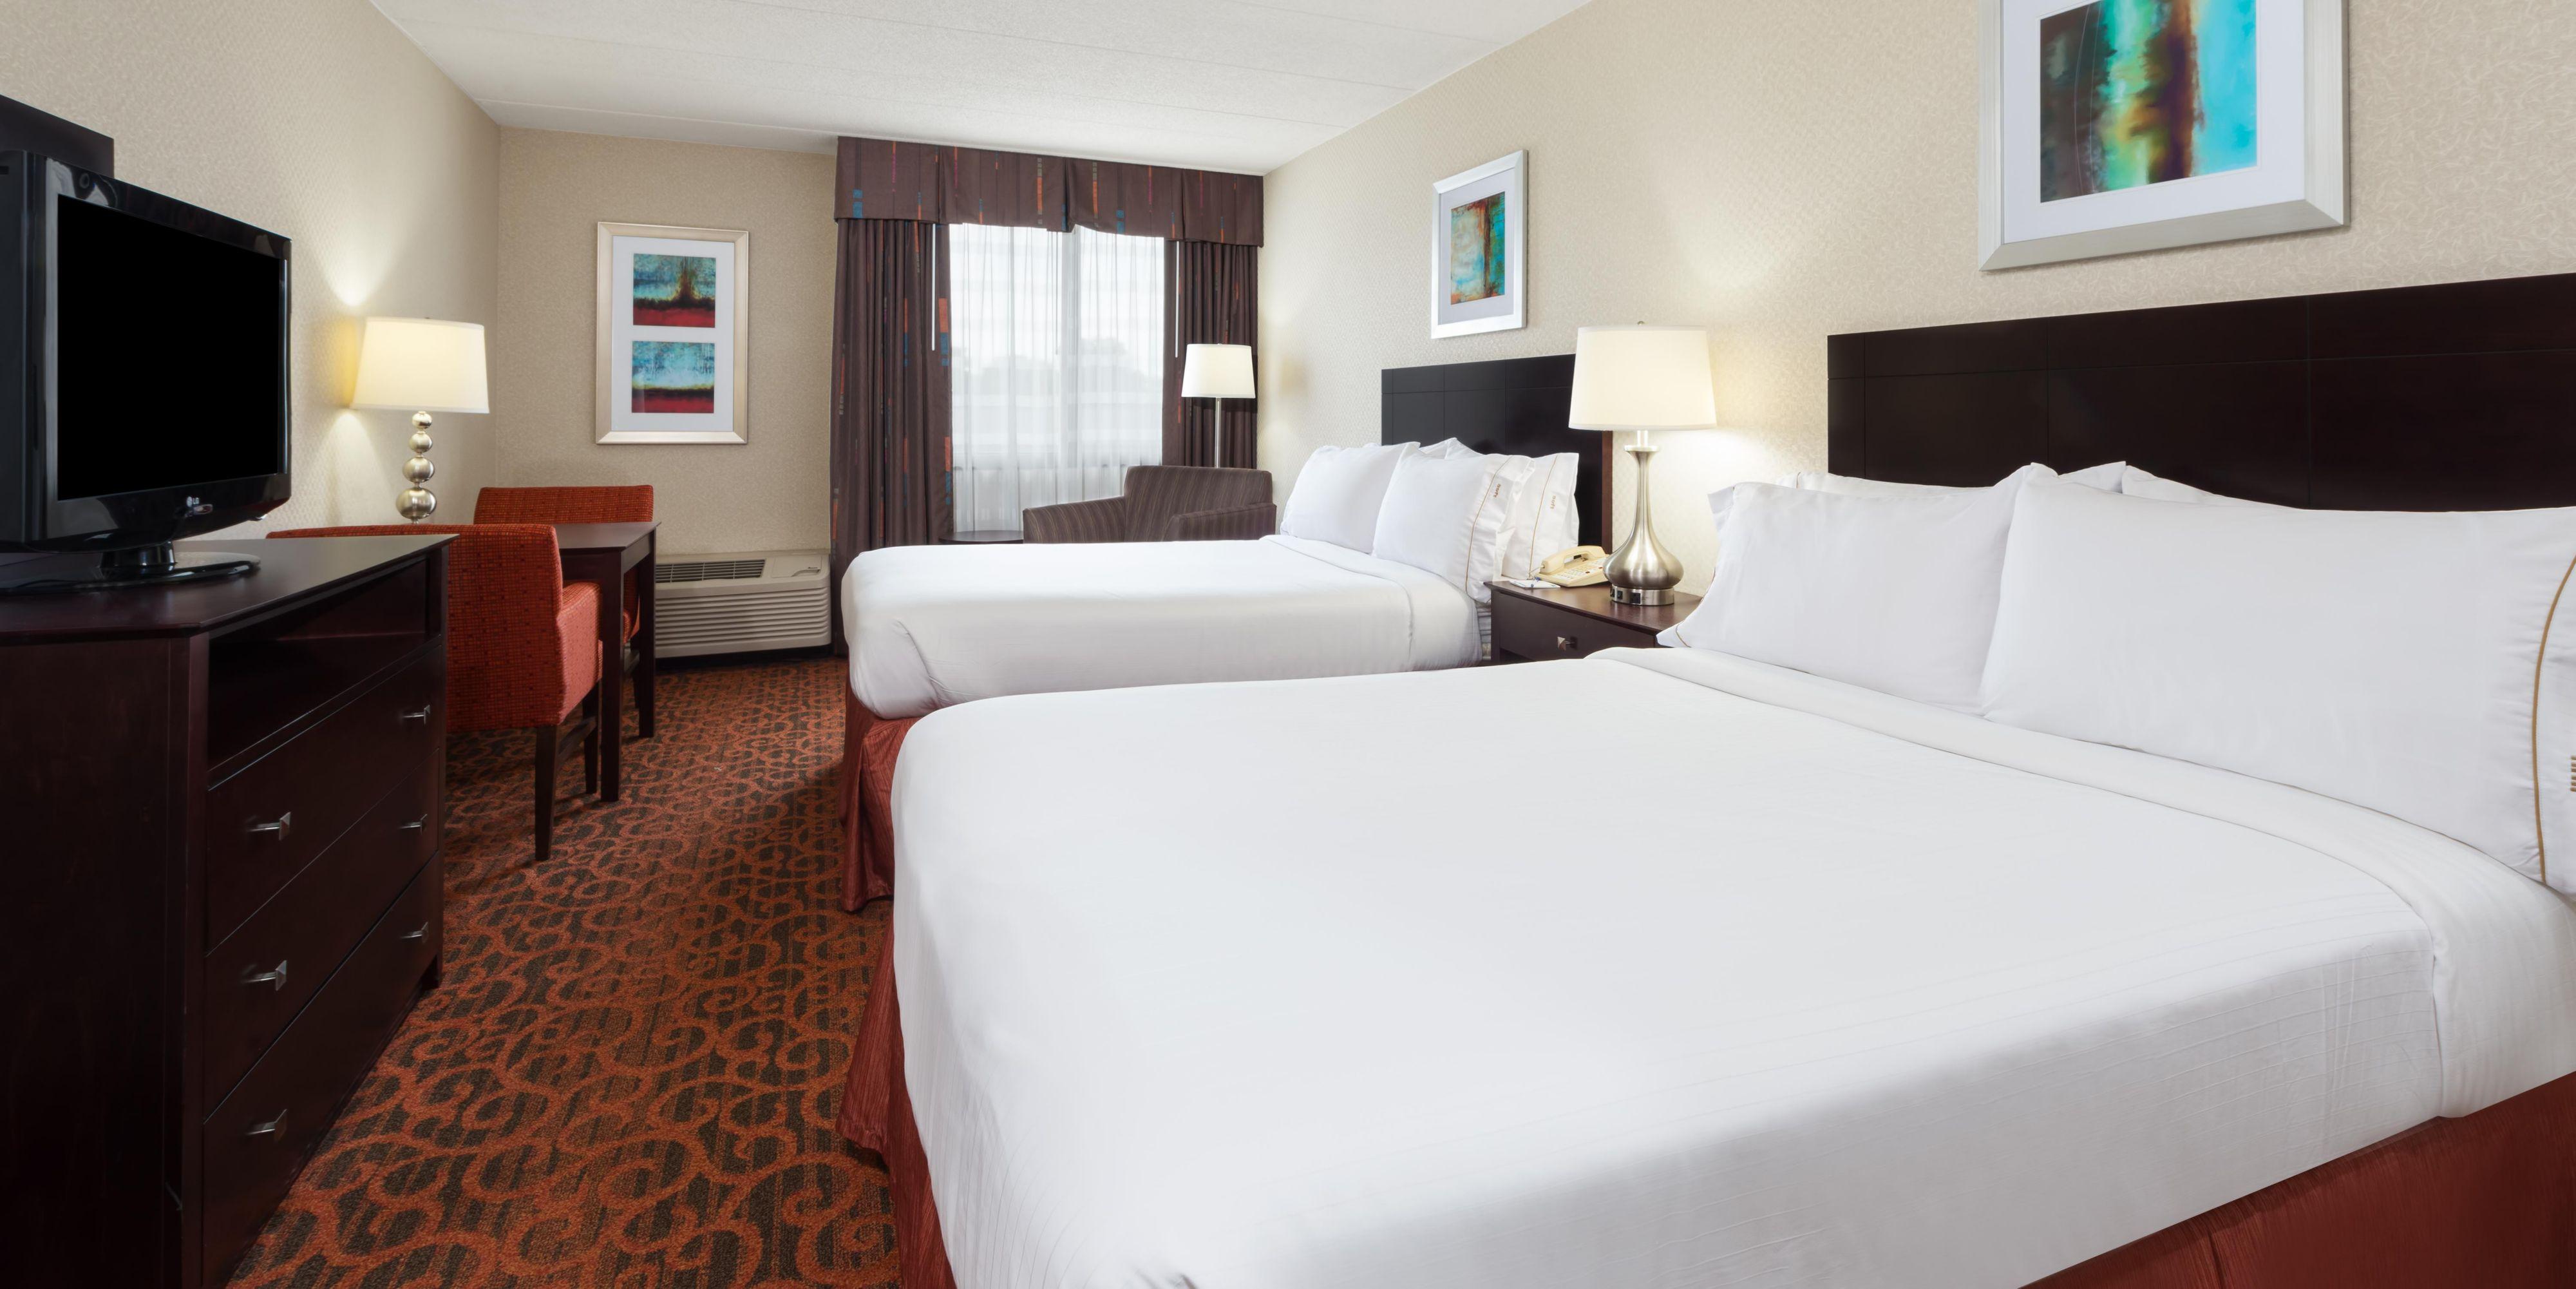 Holiday Inn Express Philadelphia NE - Bensalem Hotel in Bensalem by IHG